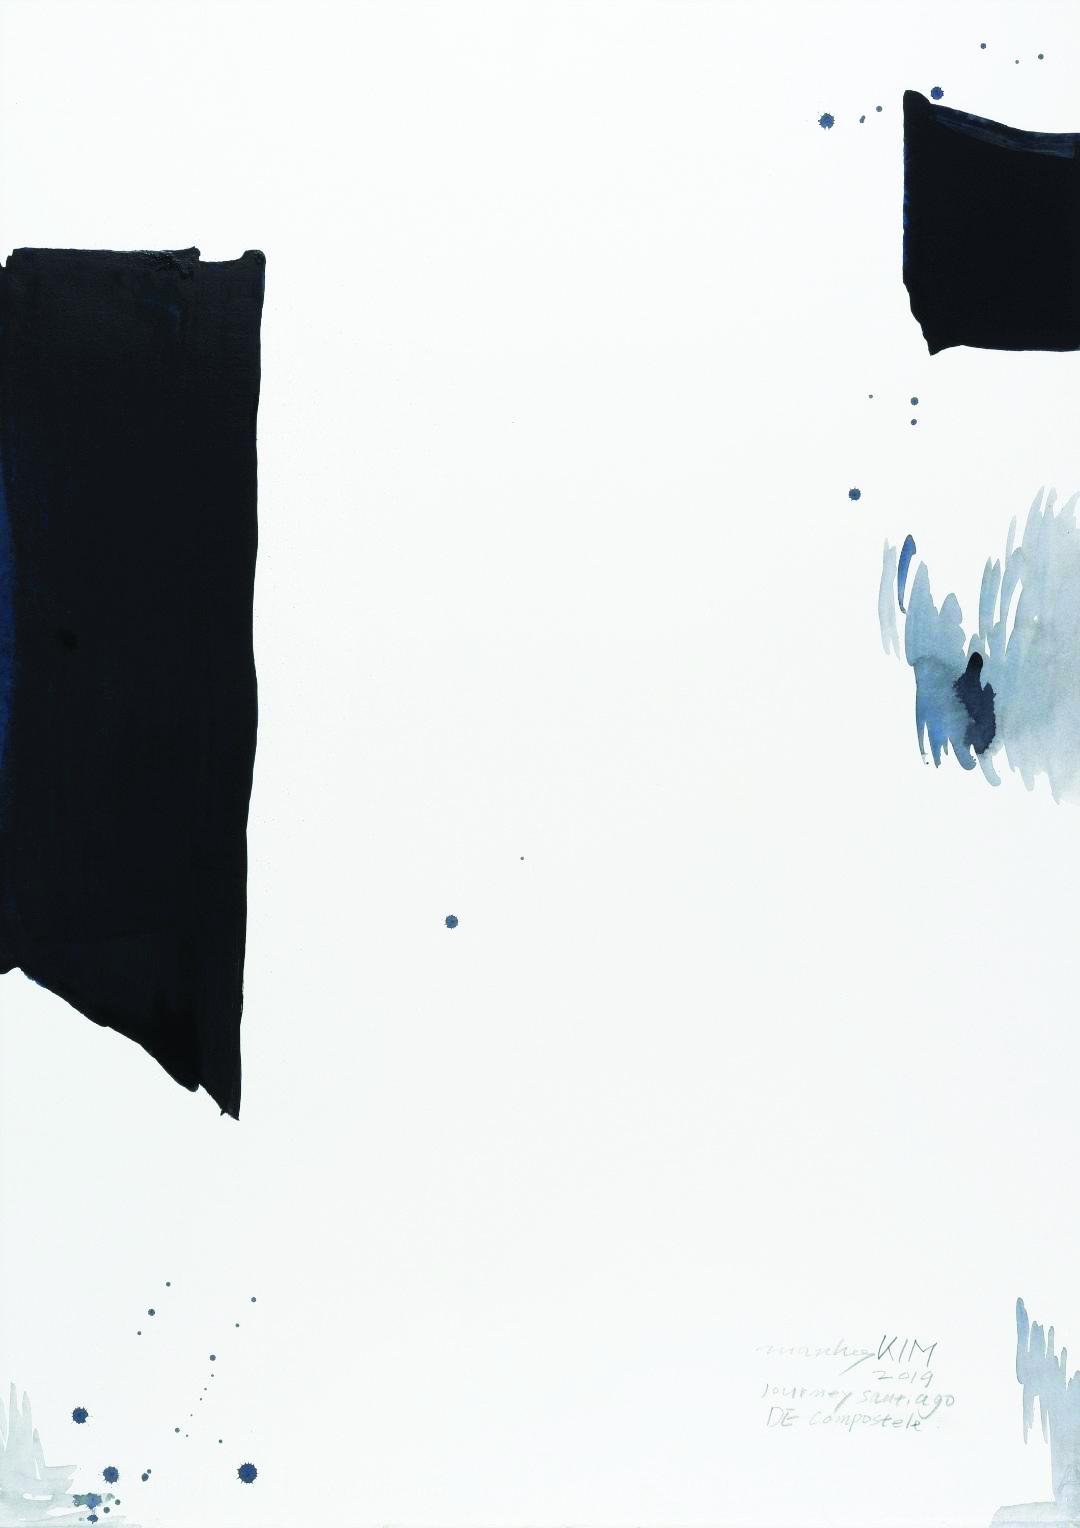 Journey Santiago DE Compostele 2, 22%22 x 30%22, Acrylic on Canvas, $2,800.jpg